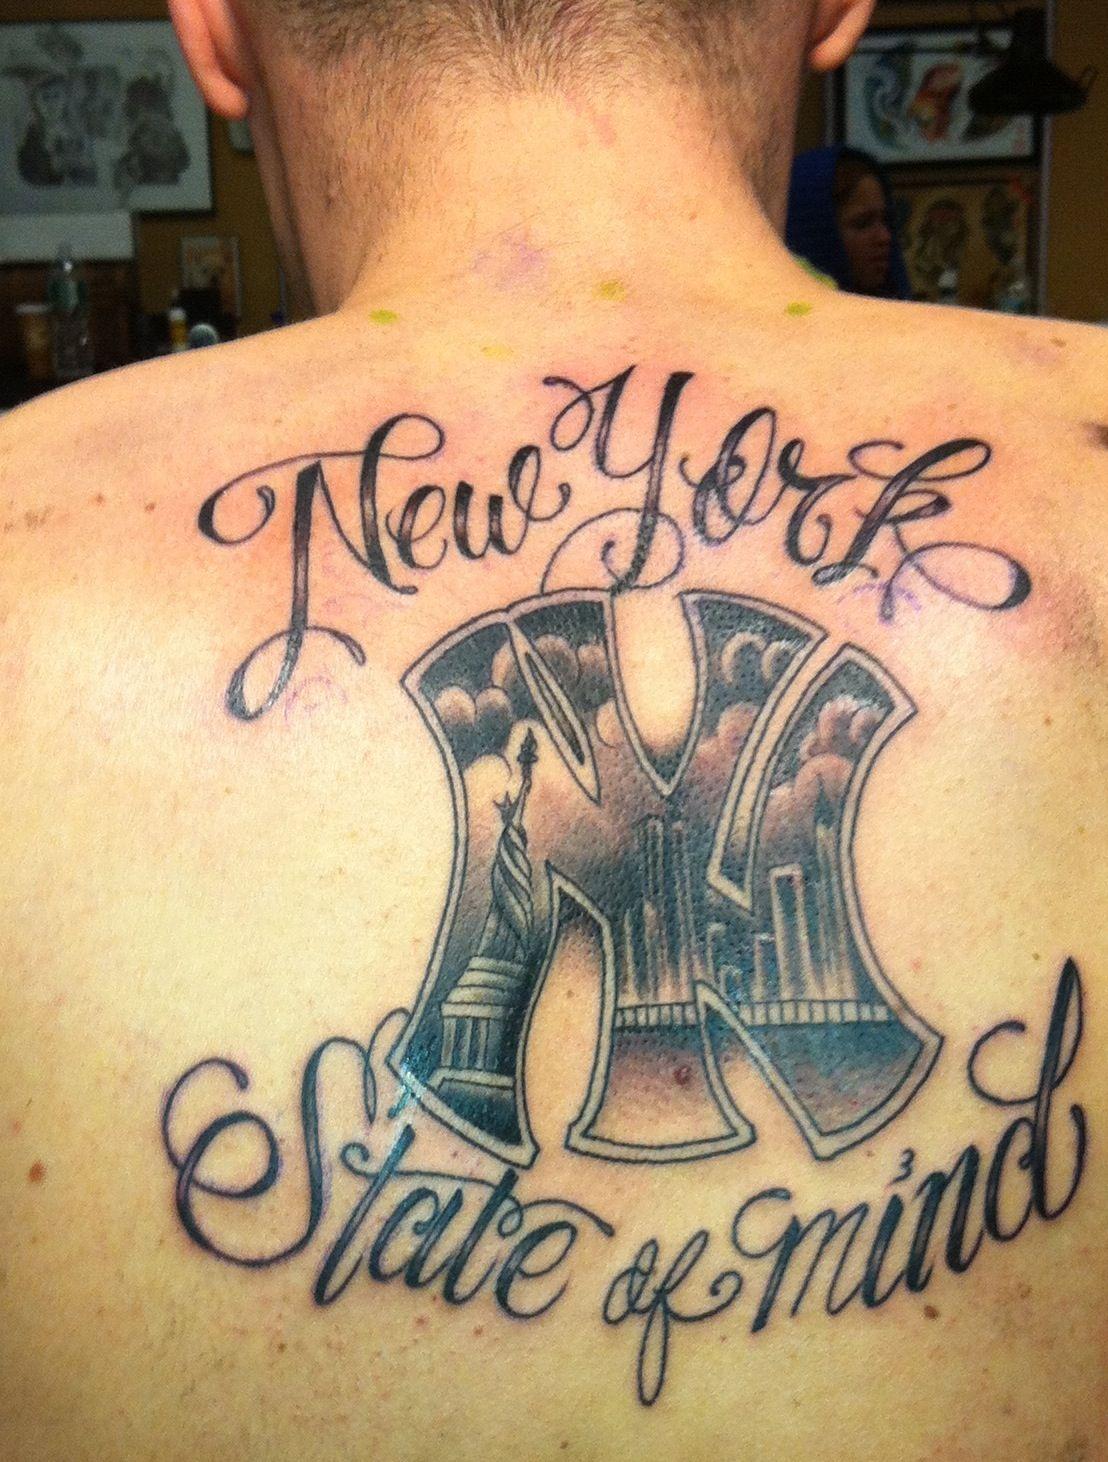 Danny mirro red rocket tattoo new york city rocket